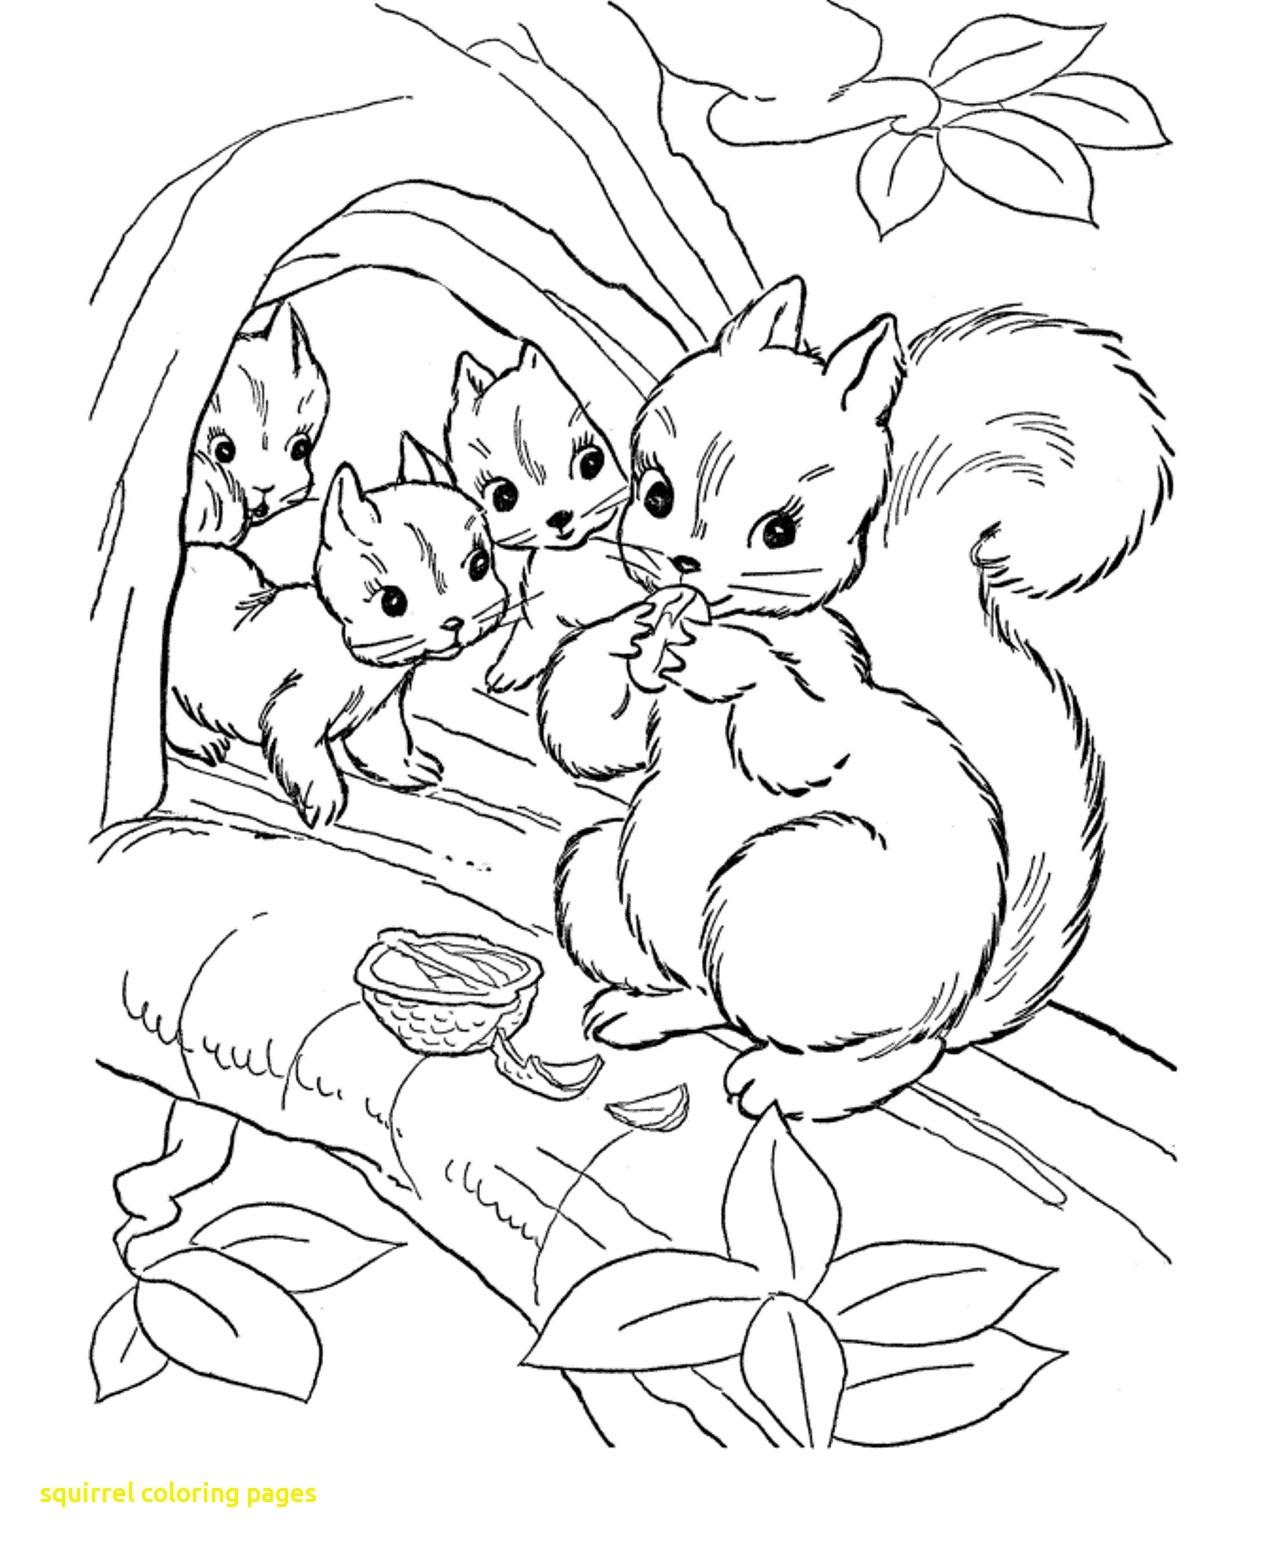 1266x1550 Squirrel Coloring Pages Squirrel Coloring Pages